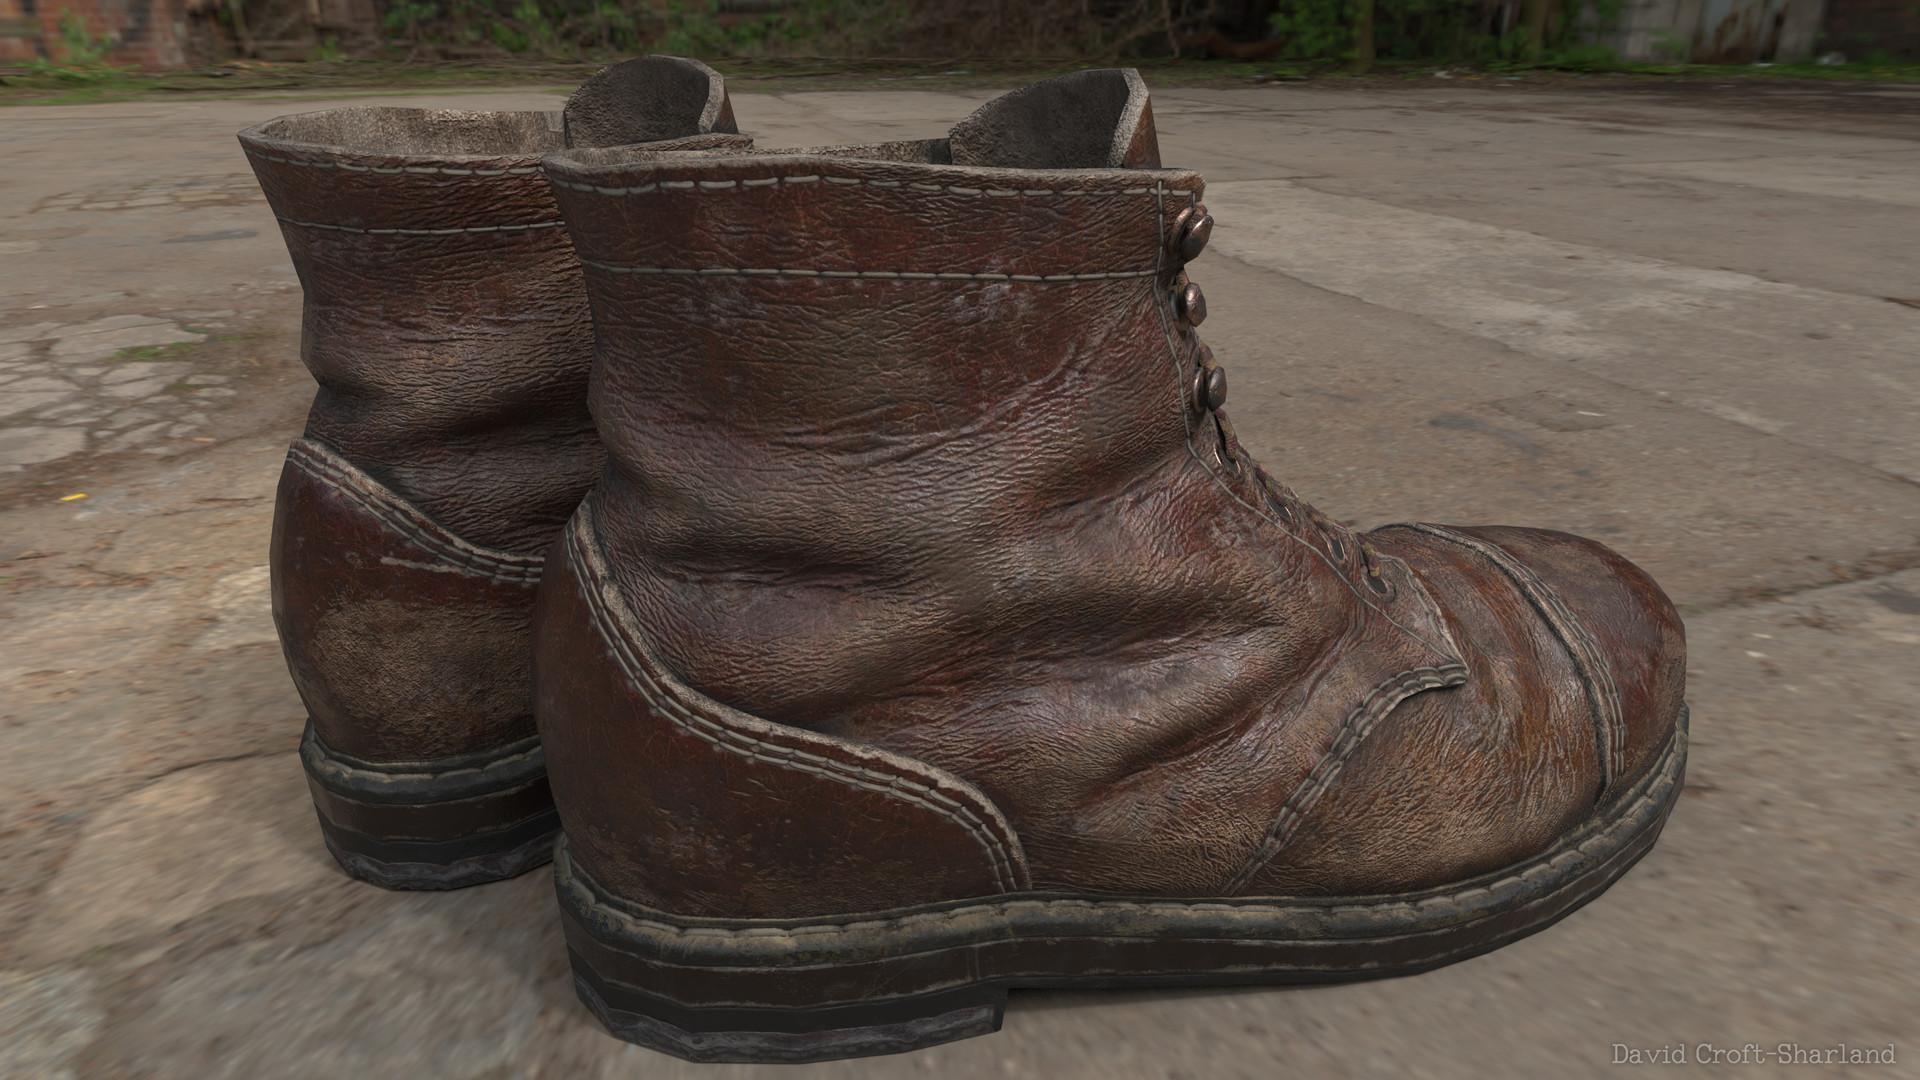 David croft sharland shoesback